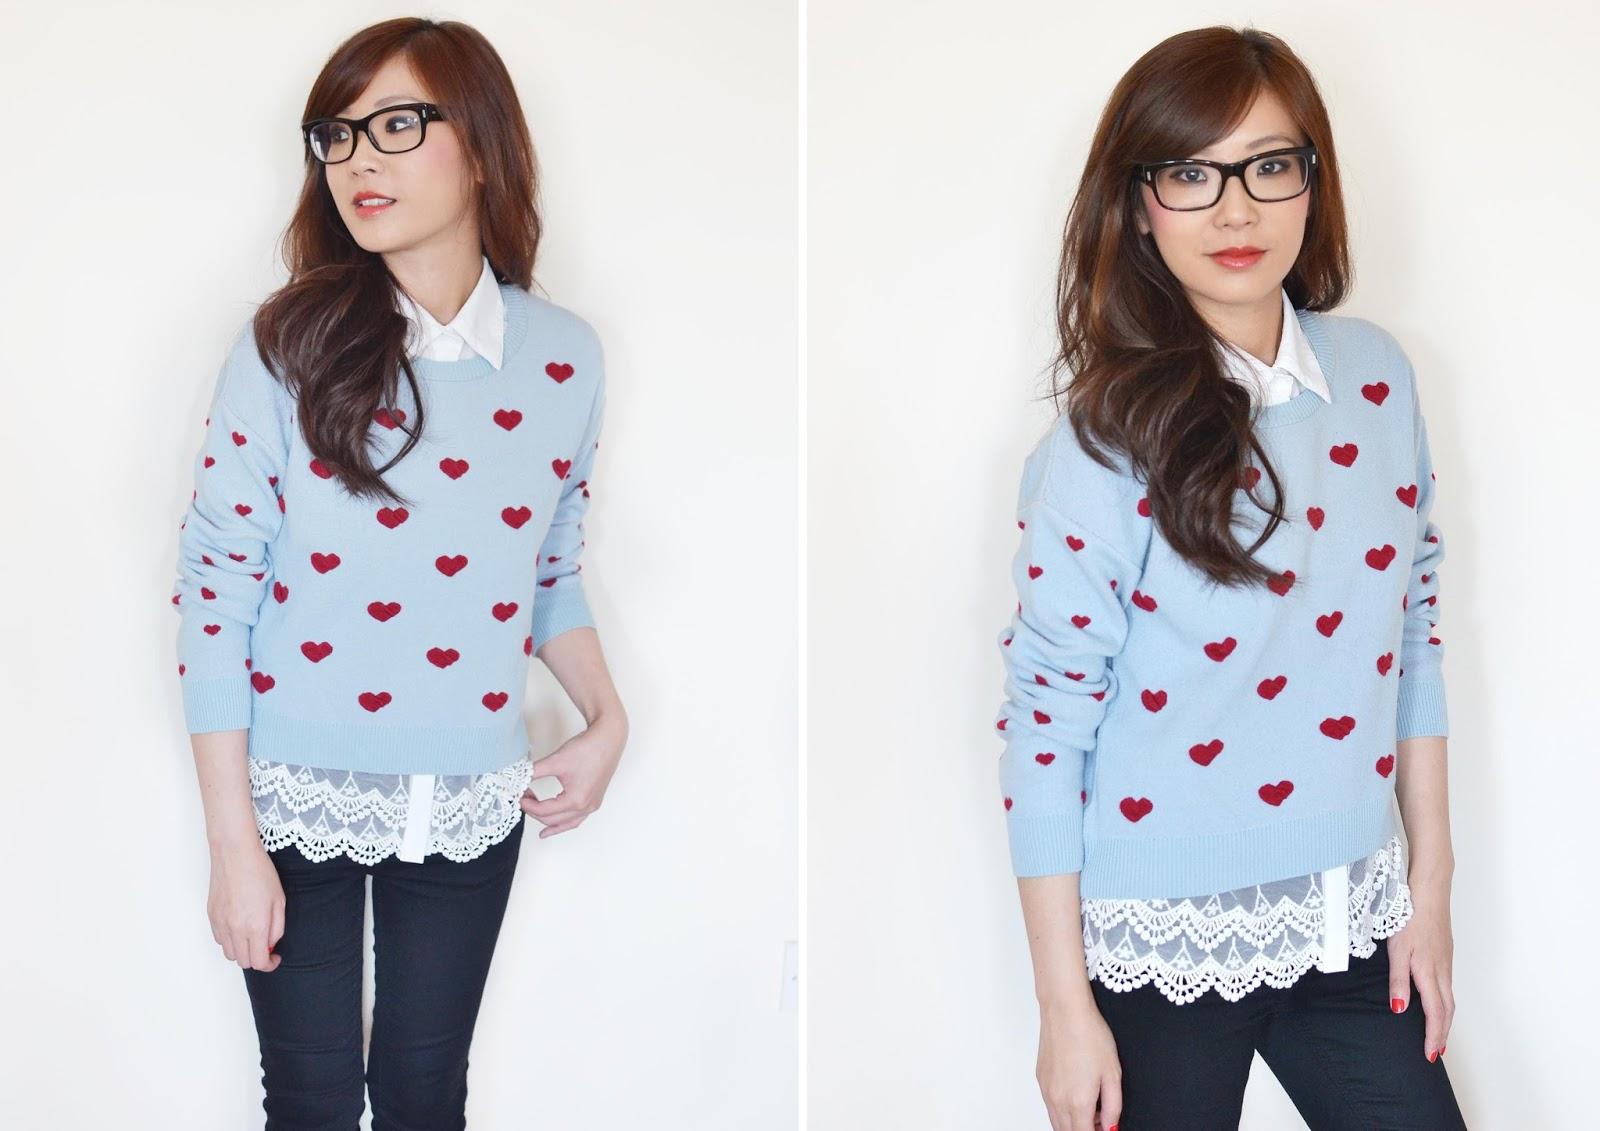 heart print trend, heart print jumper from topshop